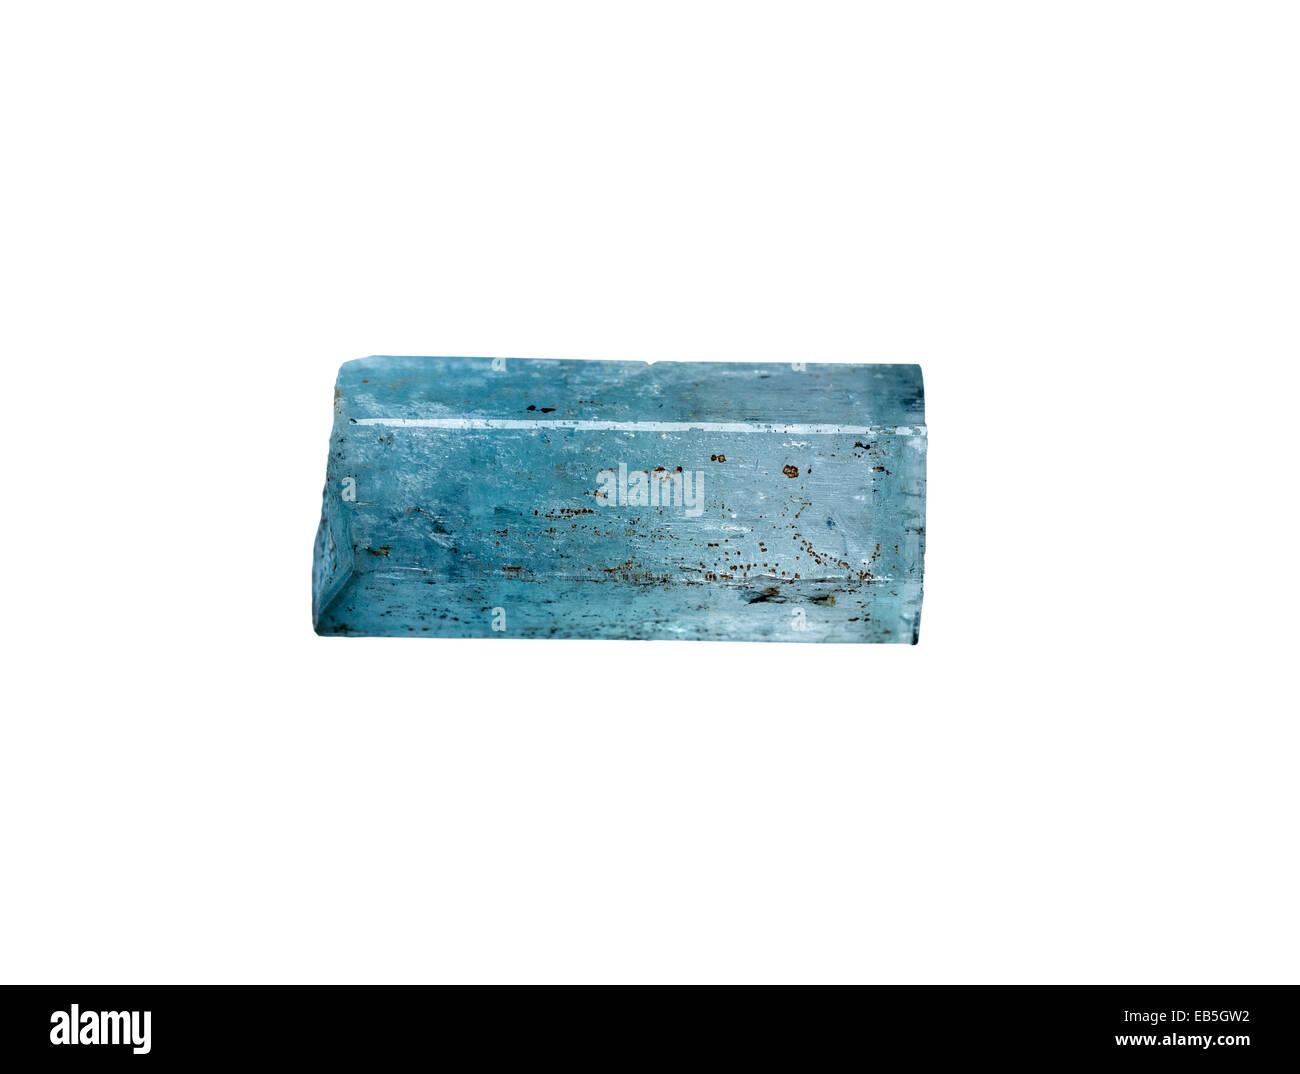 Aquamarine a transparent pale blue variety of Beryl Be3Al2Si6O18 - Stock Image